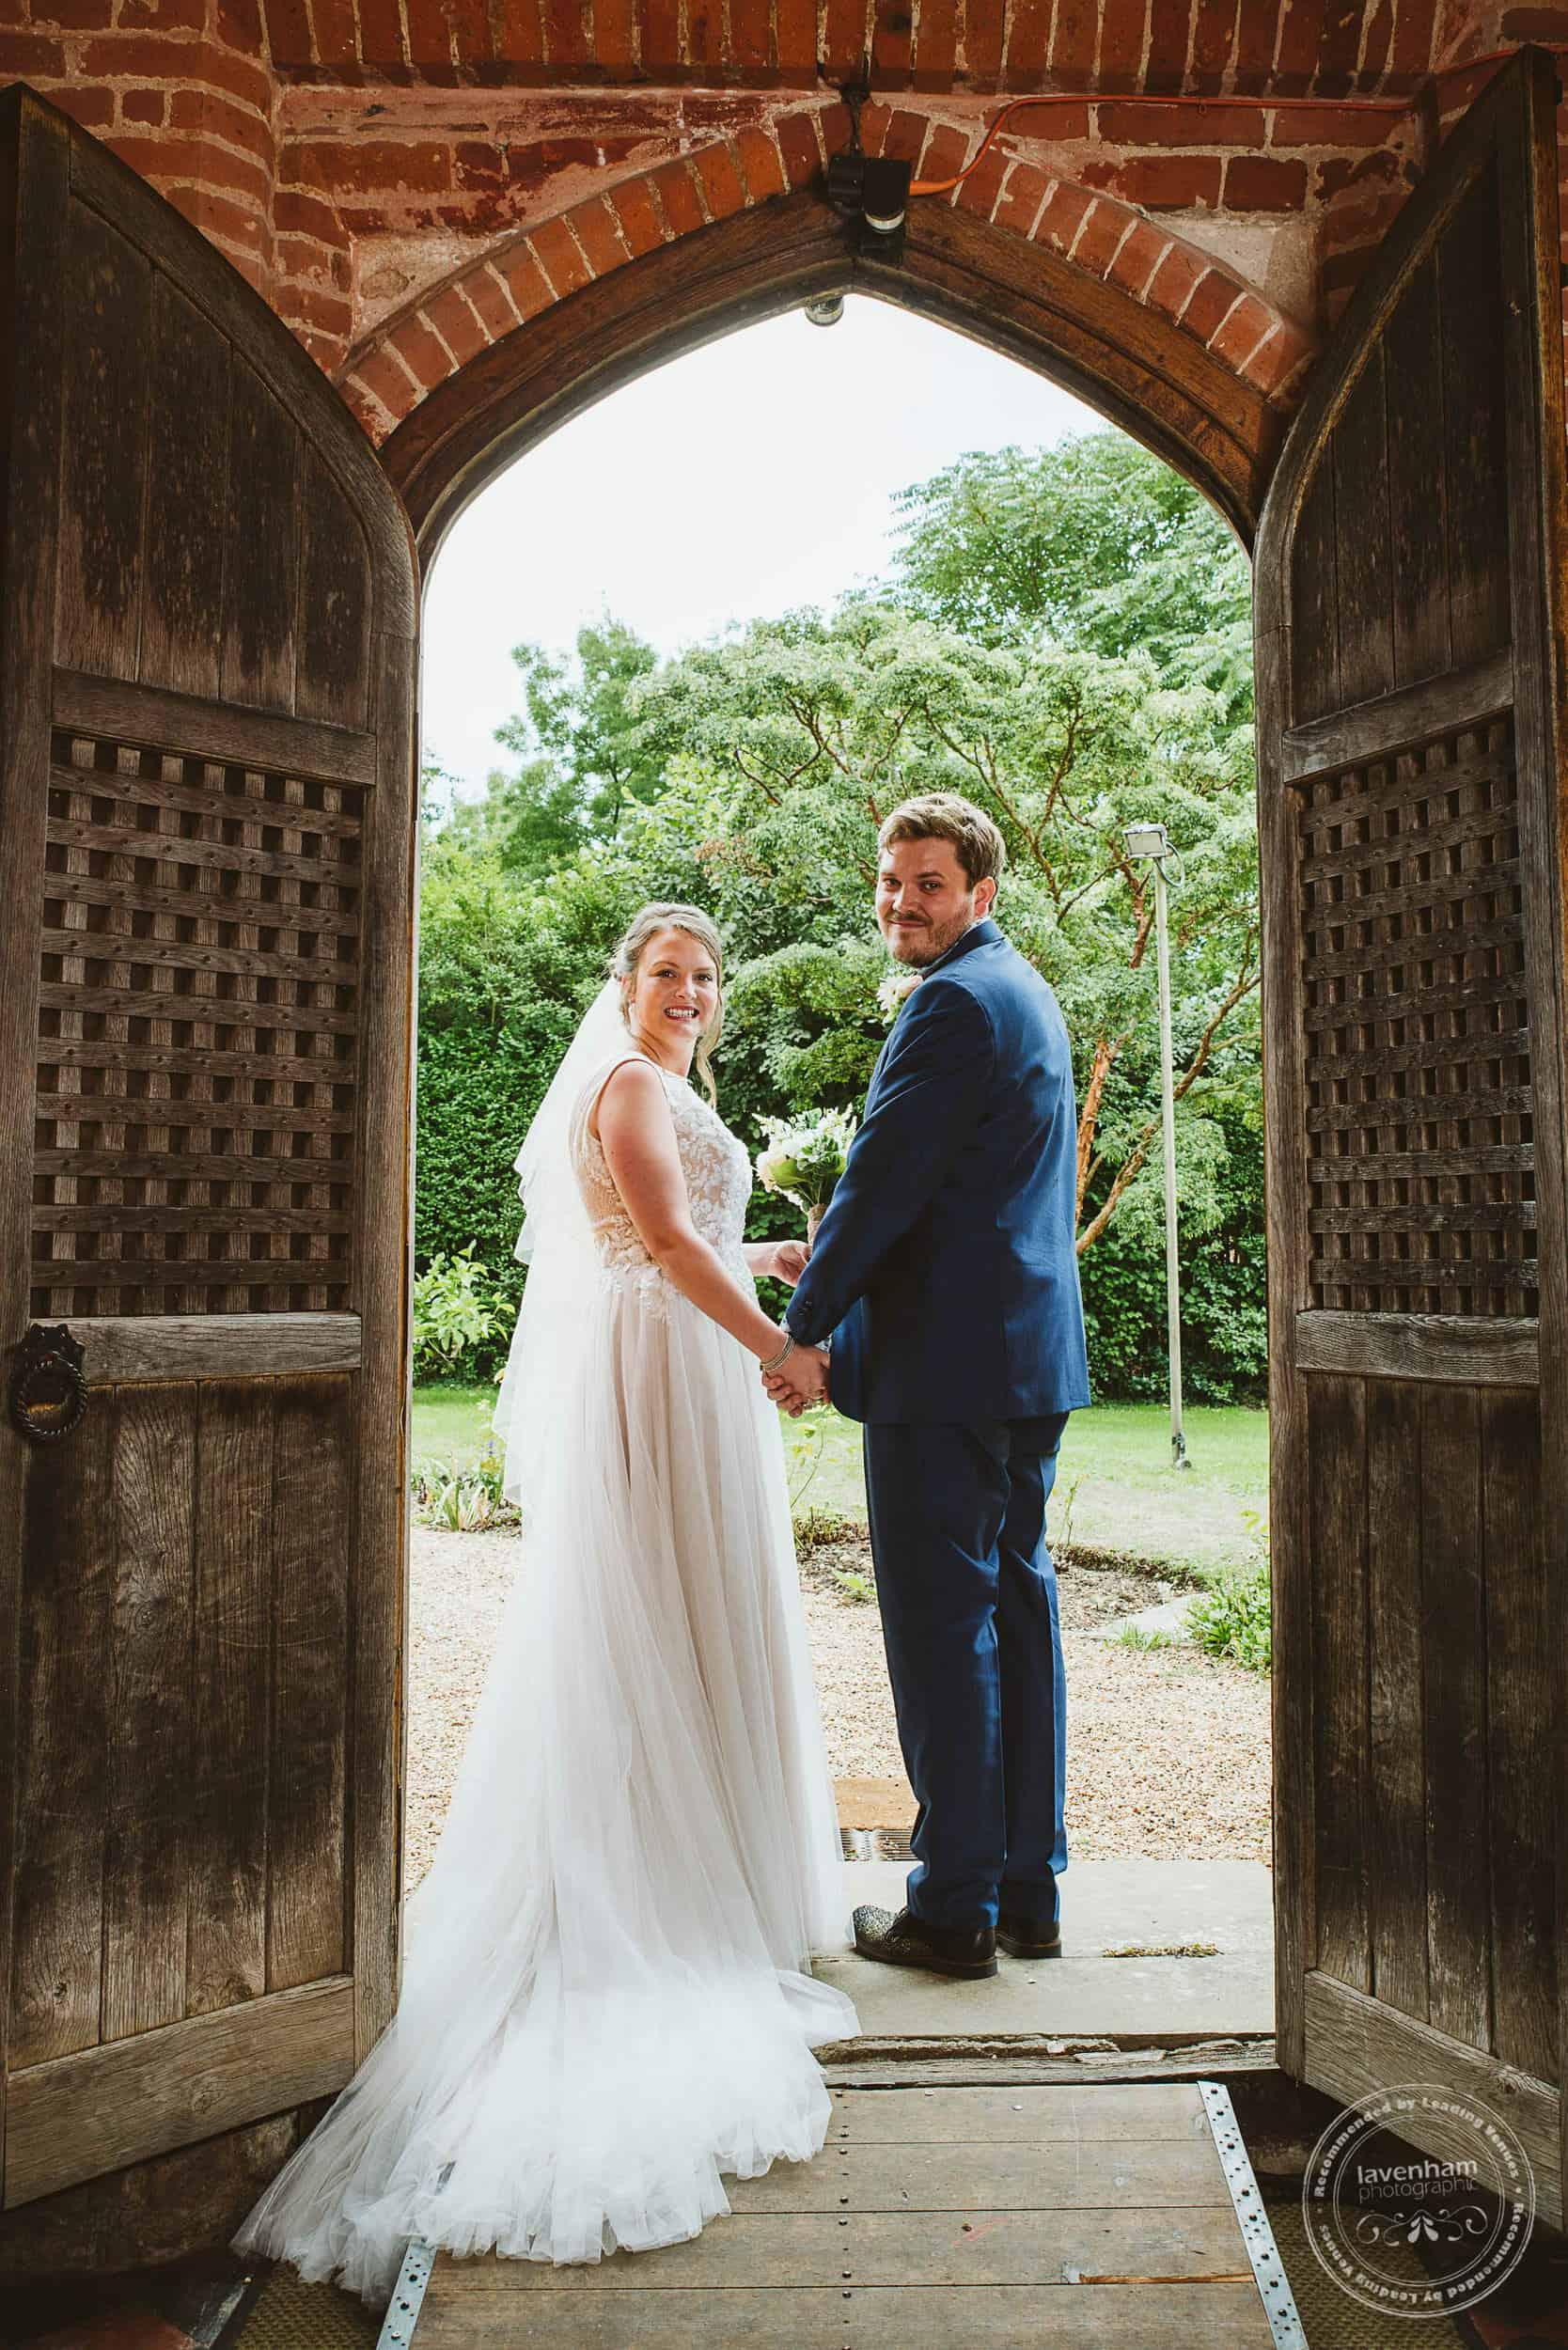 180818 Marks Hall Wedding Photography Lavenham Photographic 066